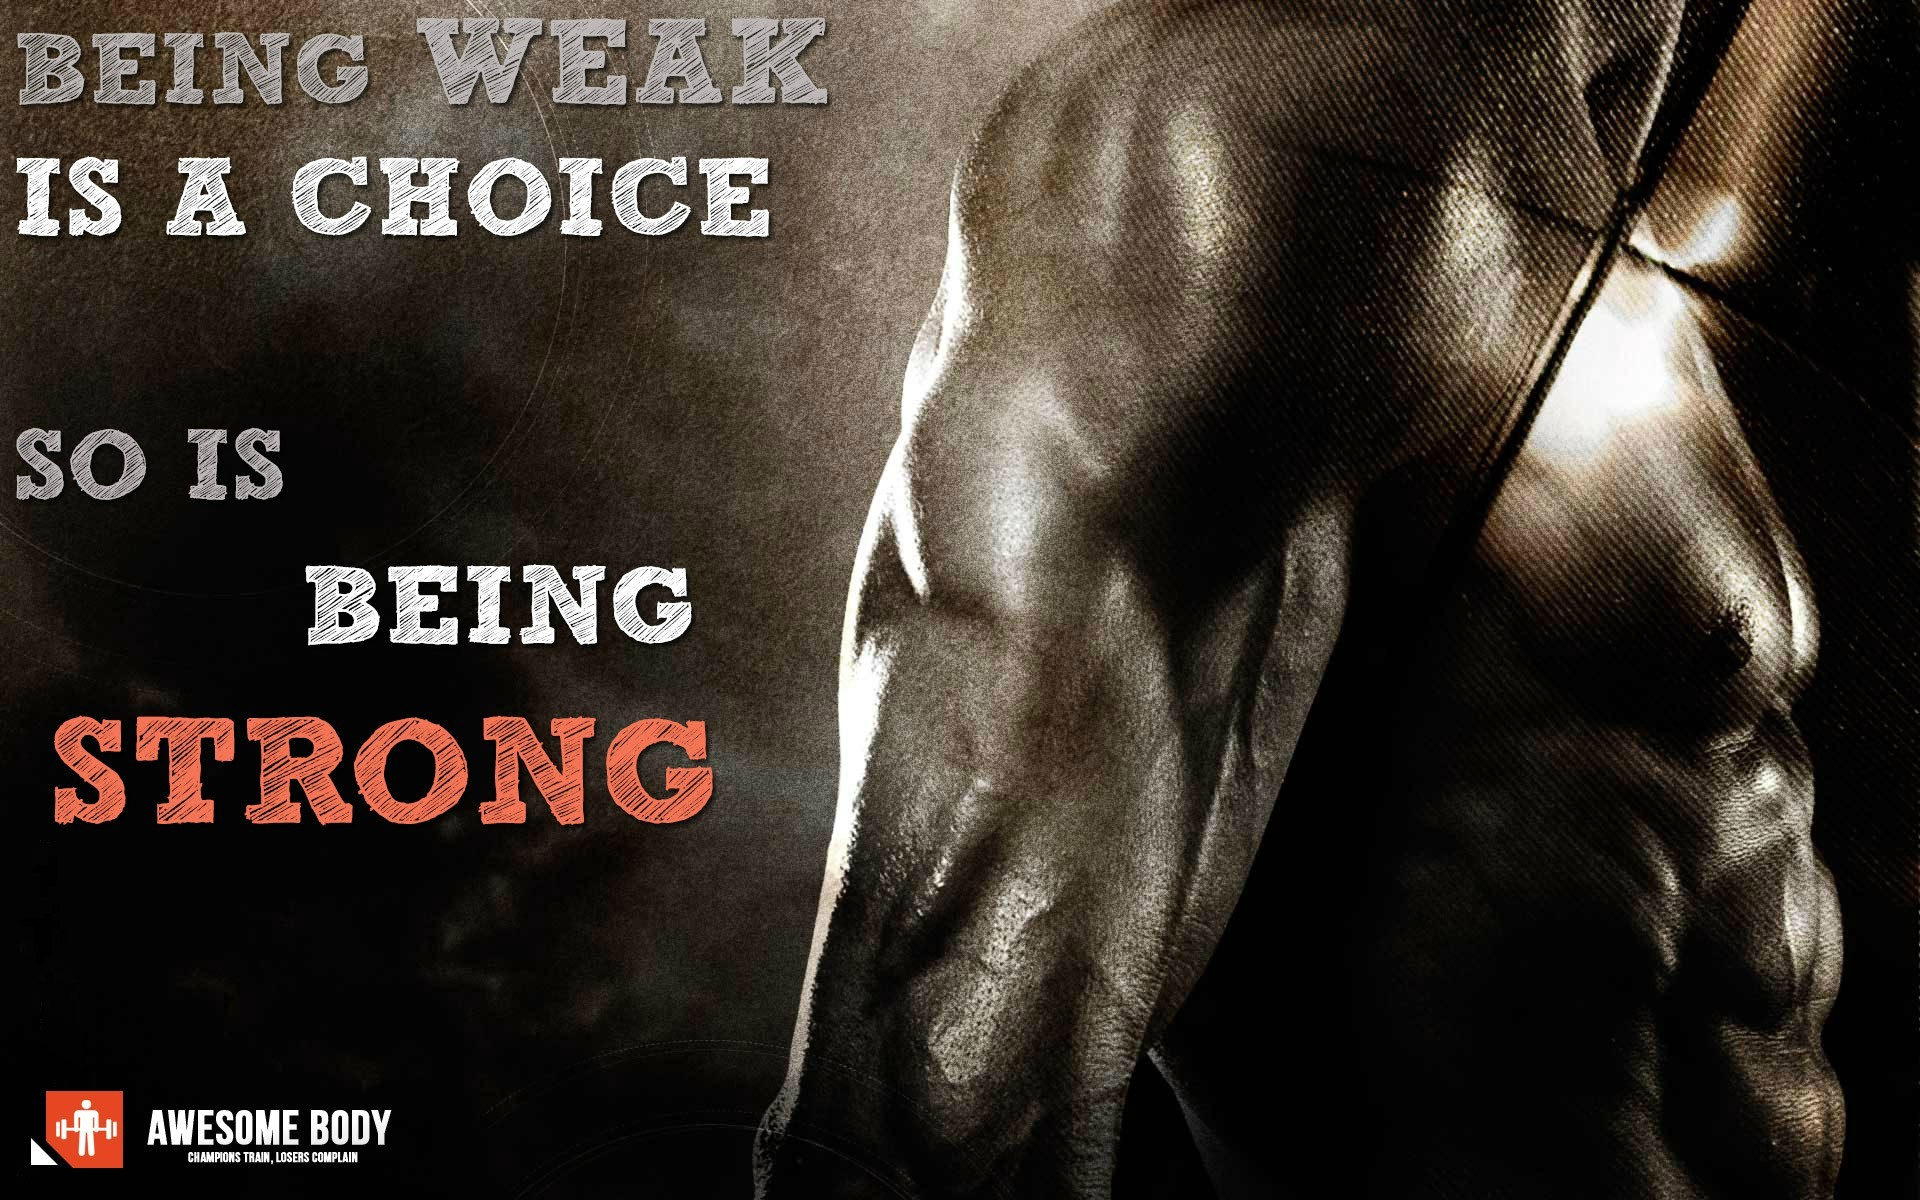 bodybuilding quotes wallpaper hd quotesgram. Bodybuilding Quotes Wallpaper  Hd Quotesgram. men bodybuilding motivation quotes …